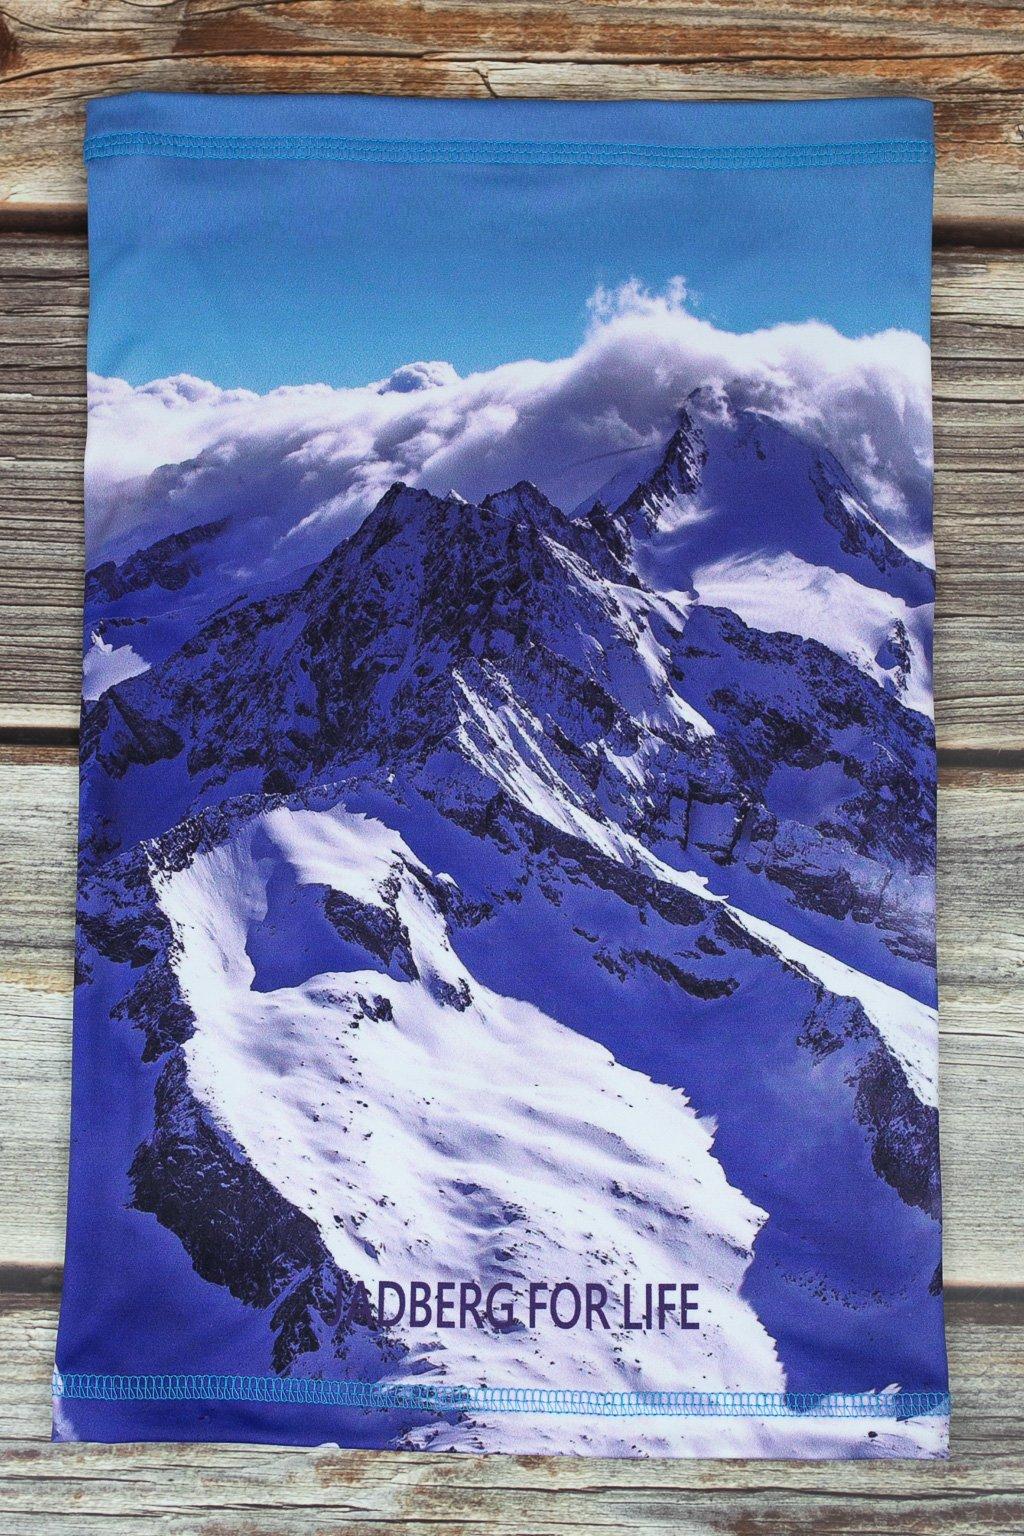 jadberg zatepleny nakrcnik mountain 1